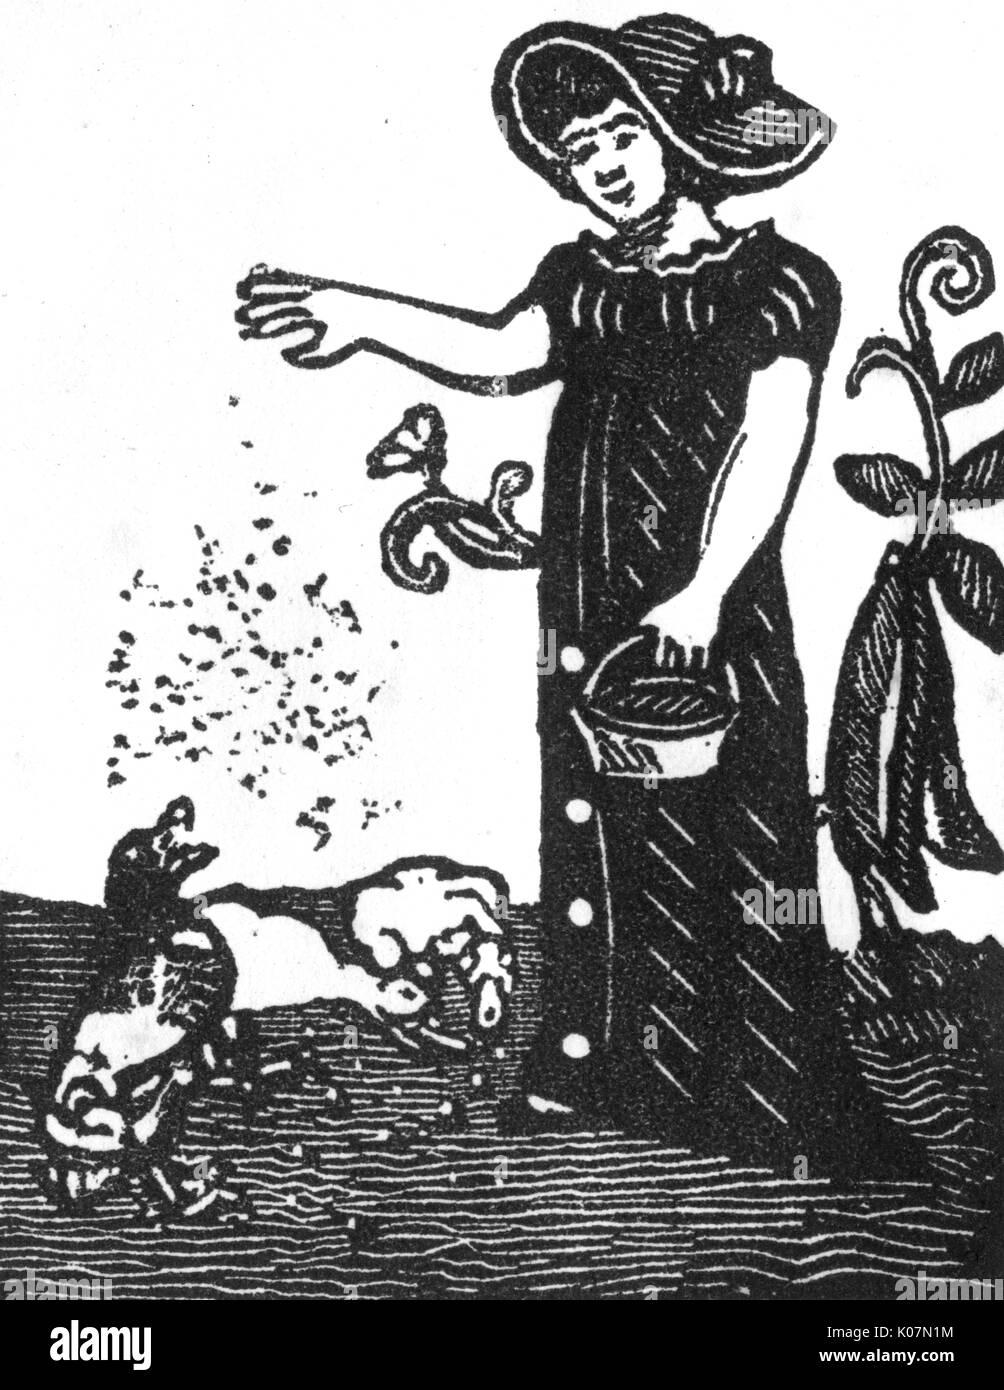 A woman feeding ducks     Date: 1800s - Stock Image